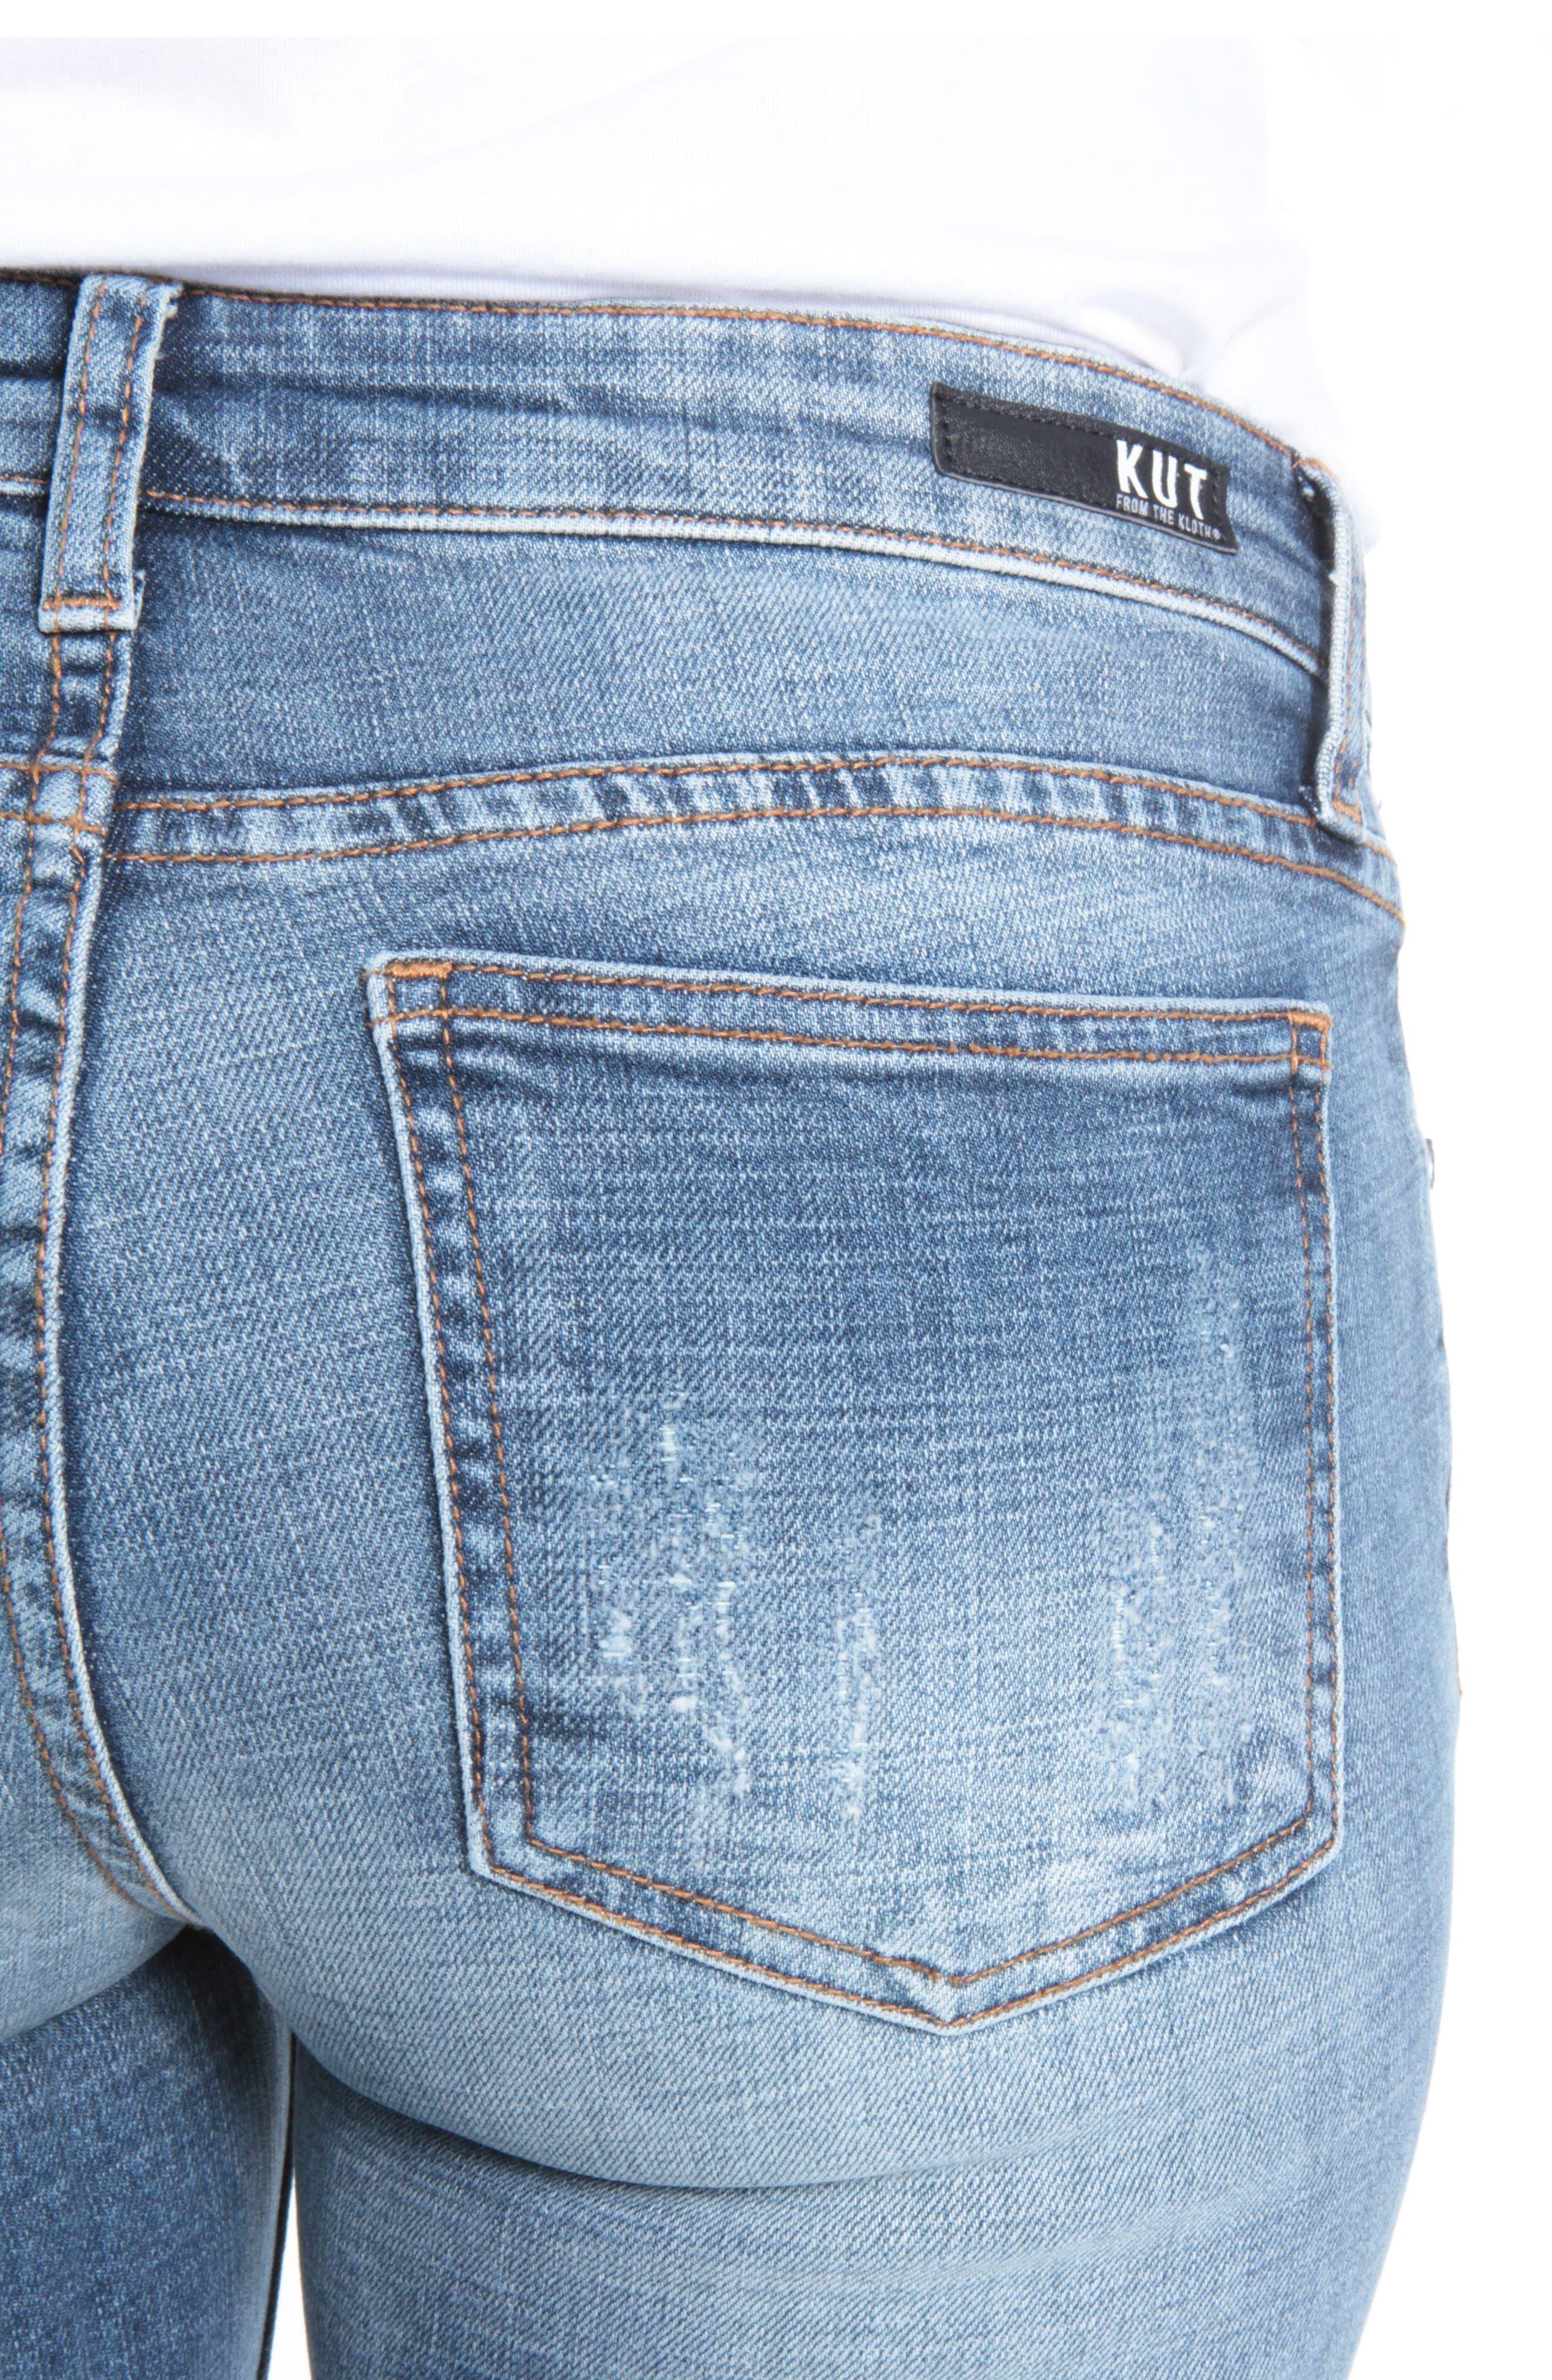 Alternate Image 4  - Kut from the Kloth Catherine Boyfriend Jeans (Livened)